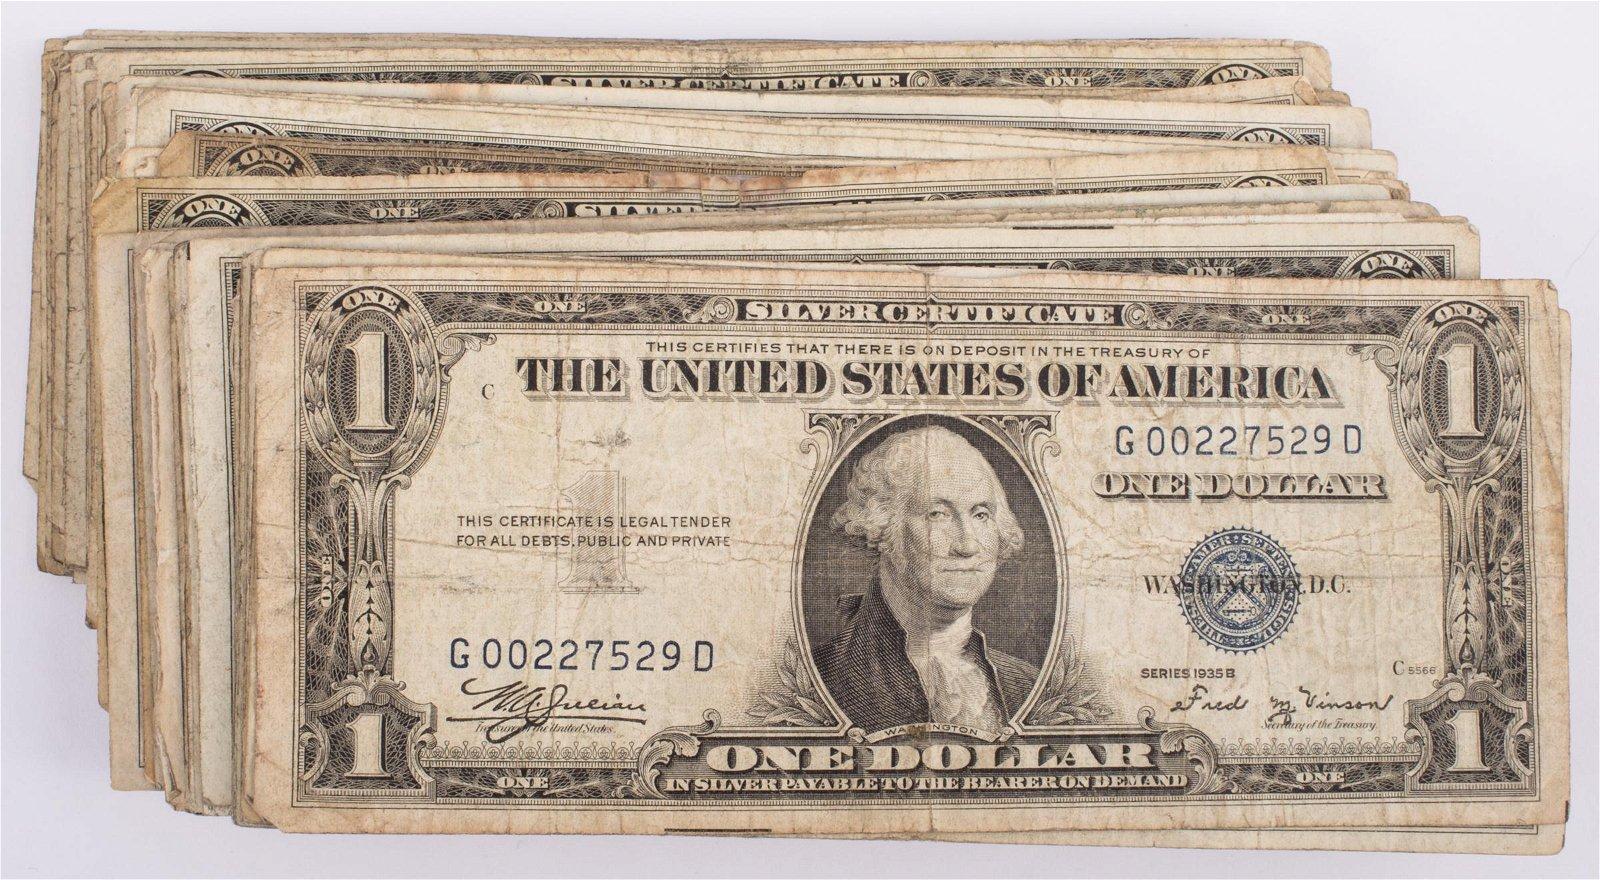 1935 $1 SILVER CERTIFICATES (108)